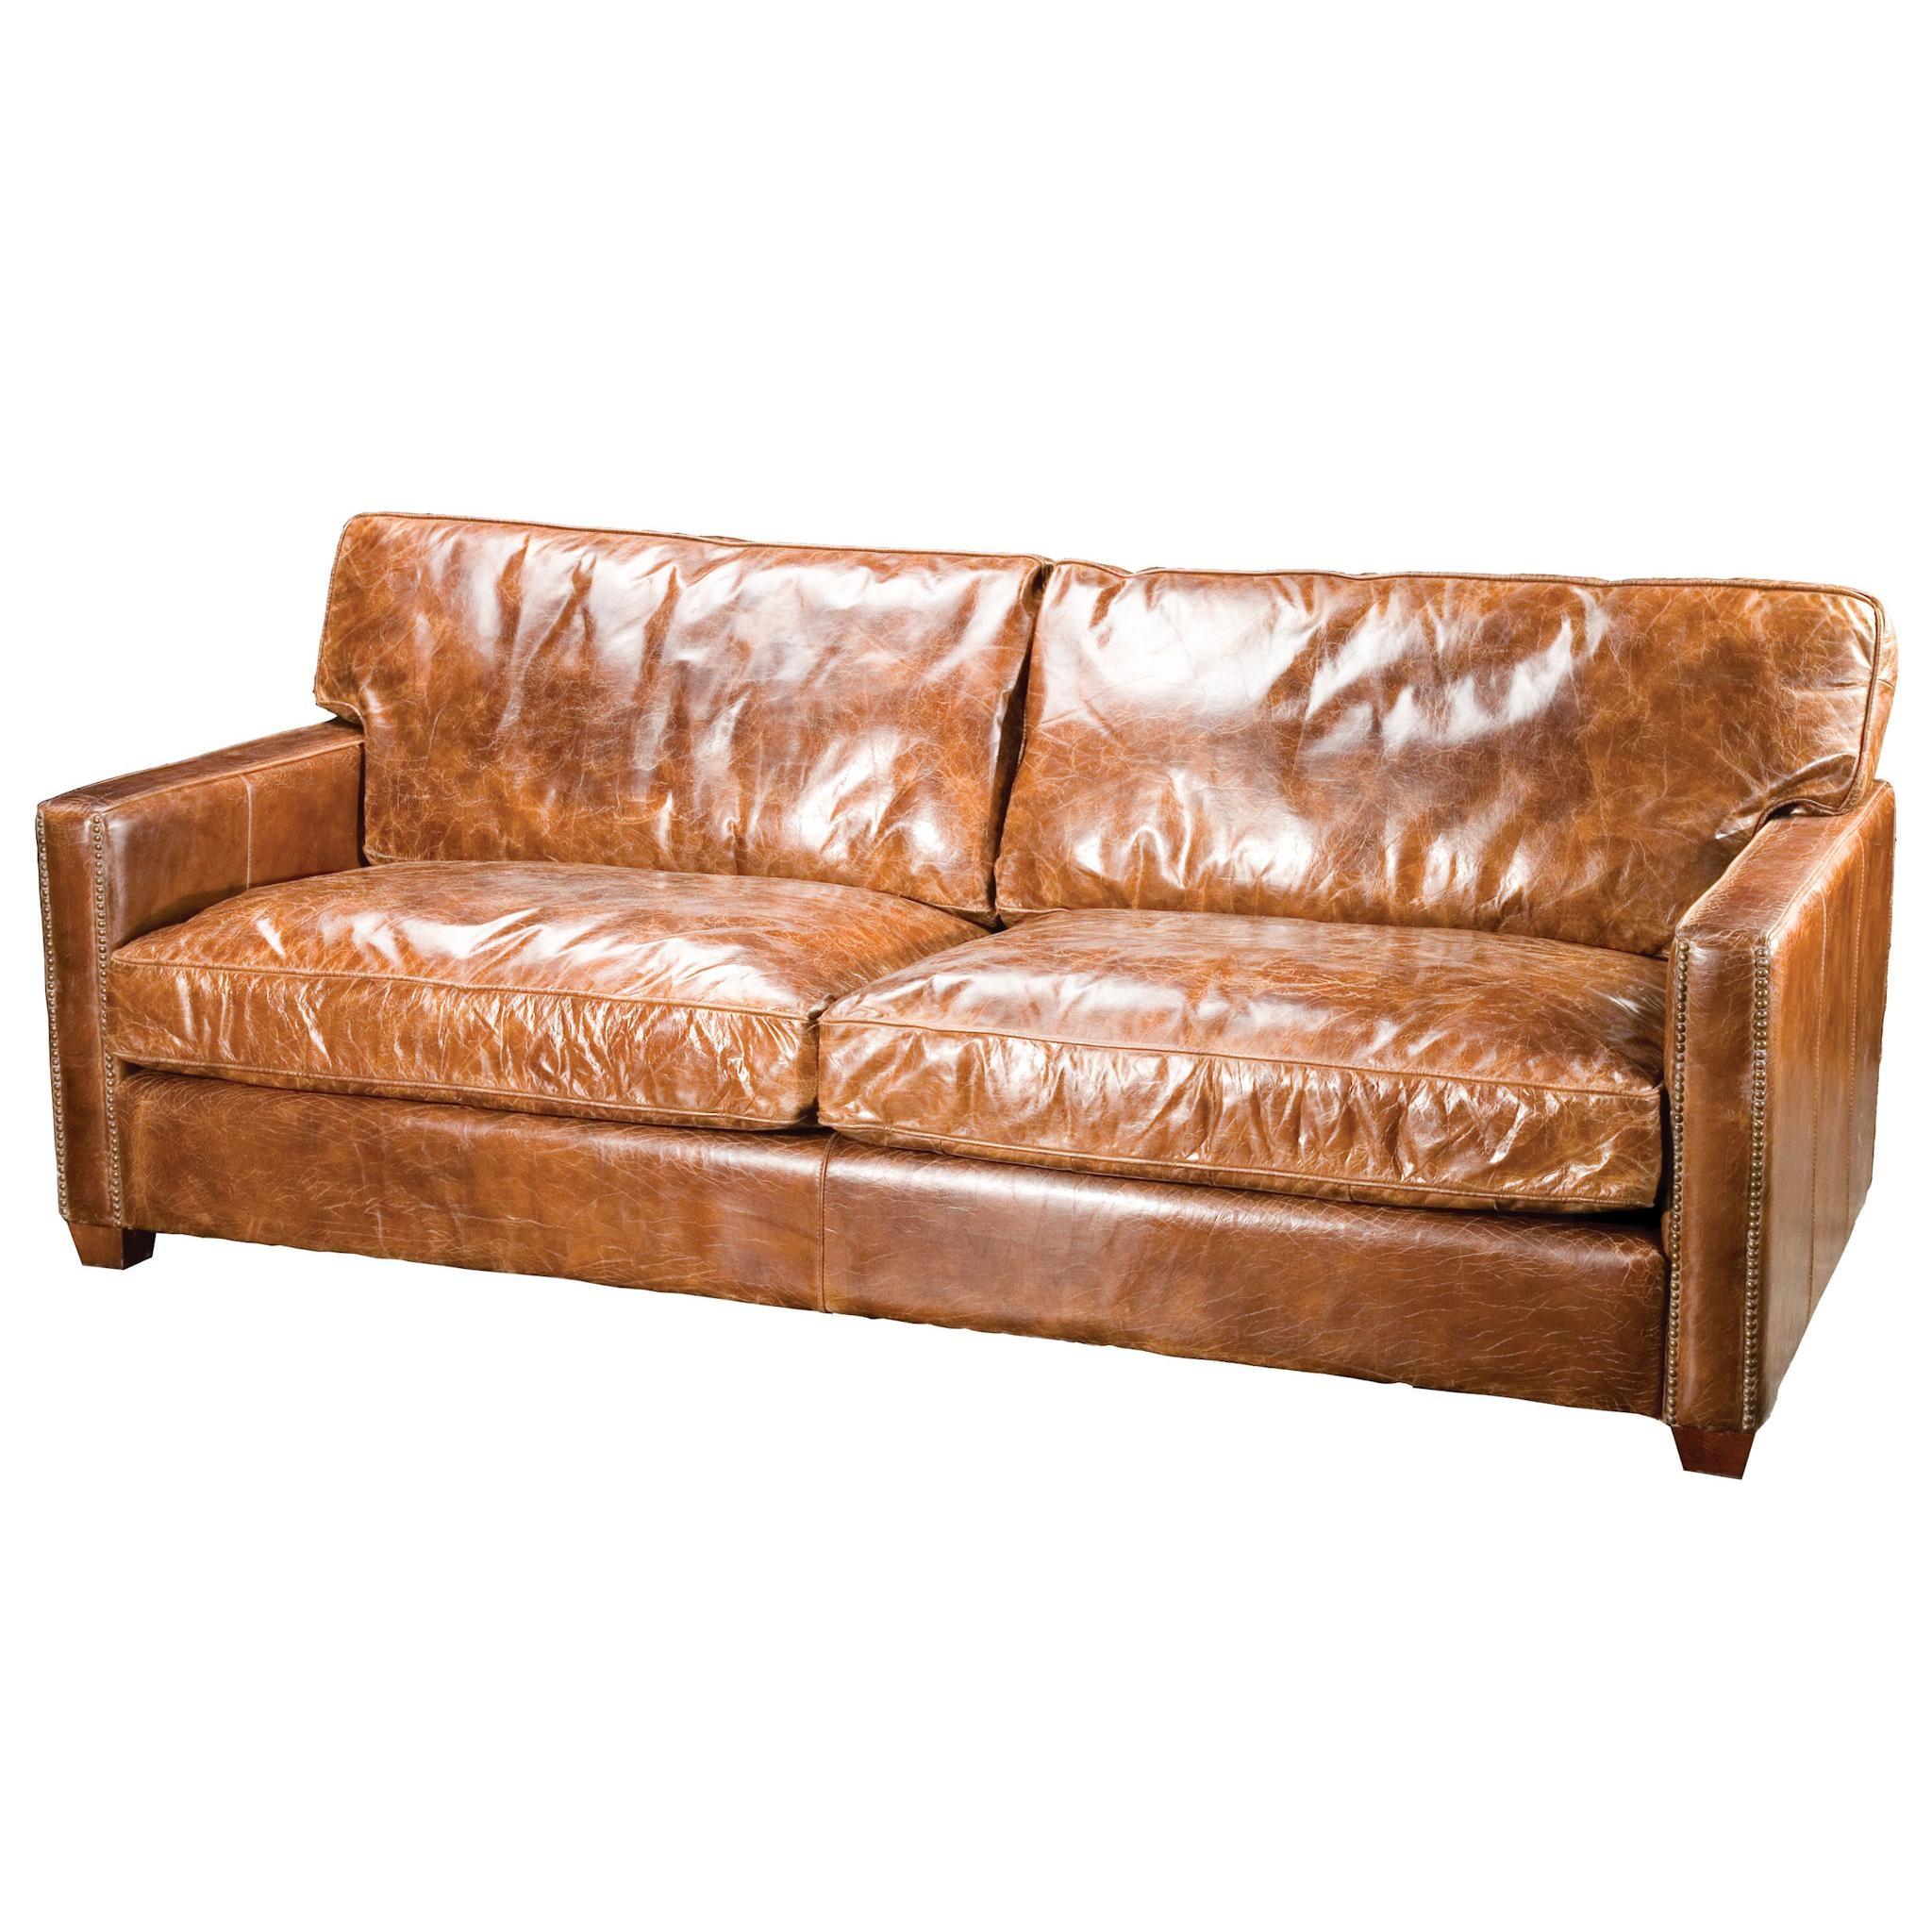 Furniture: Elegant Full Grain Leather Sofa For Luxury Living Room For Full Grain Leather Sofas (View 5 of 20)